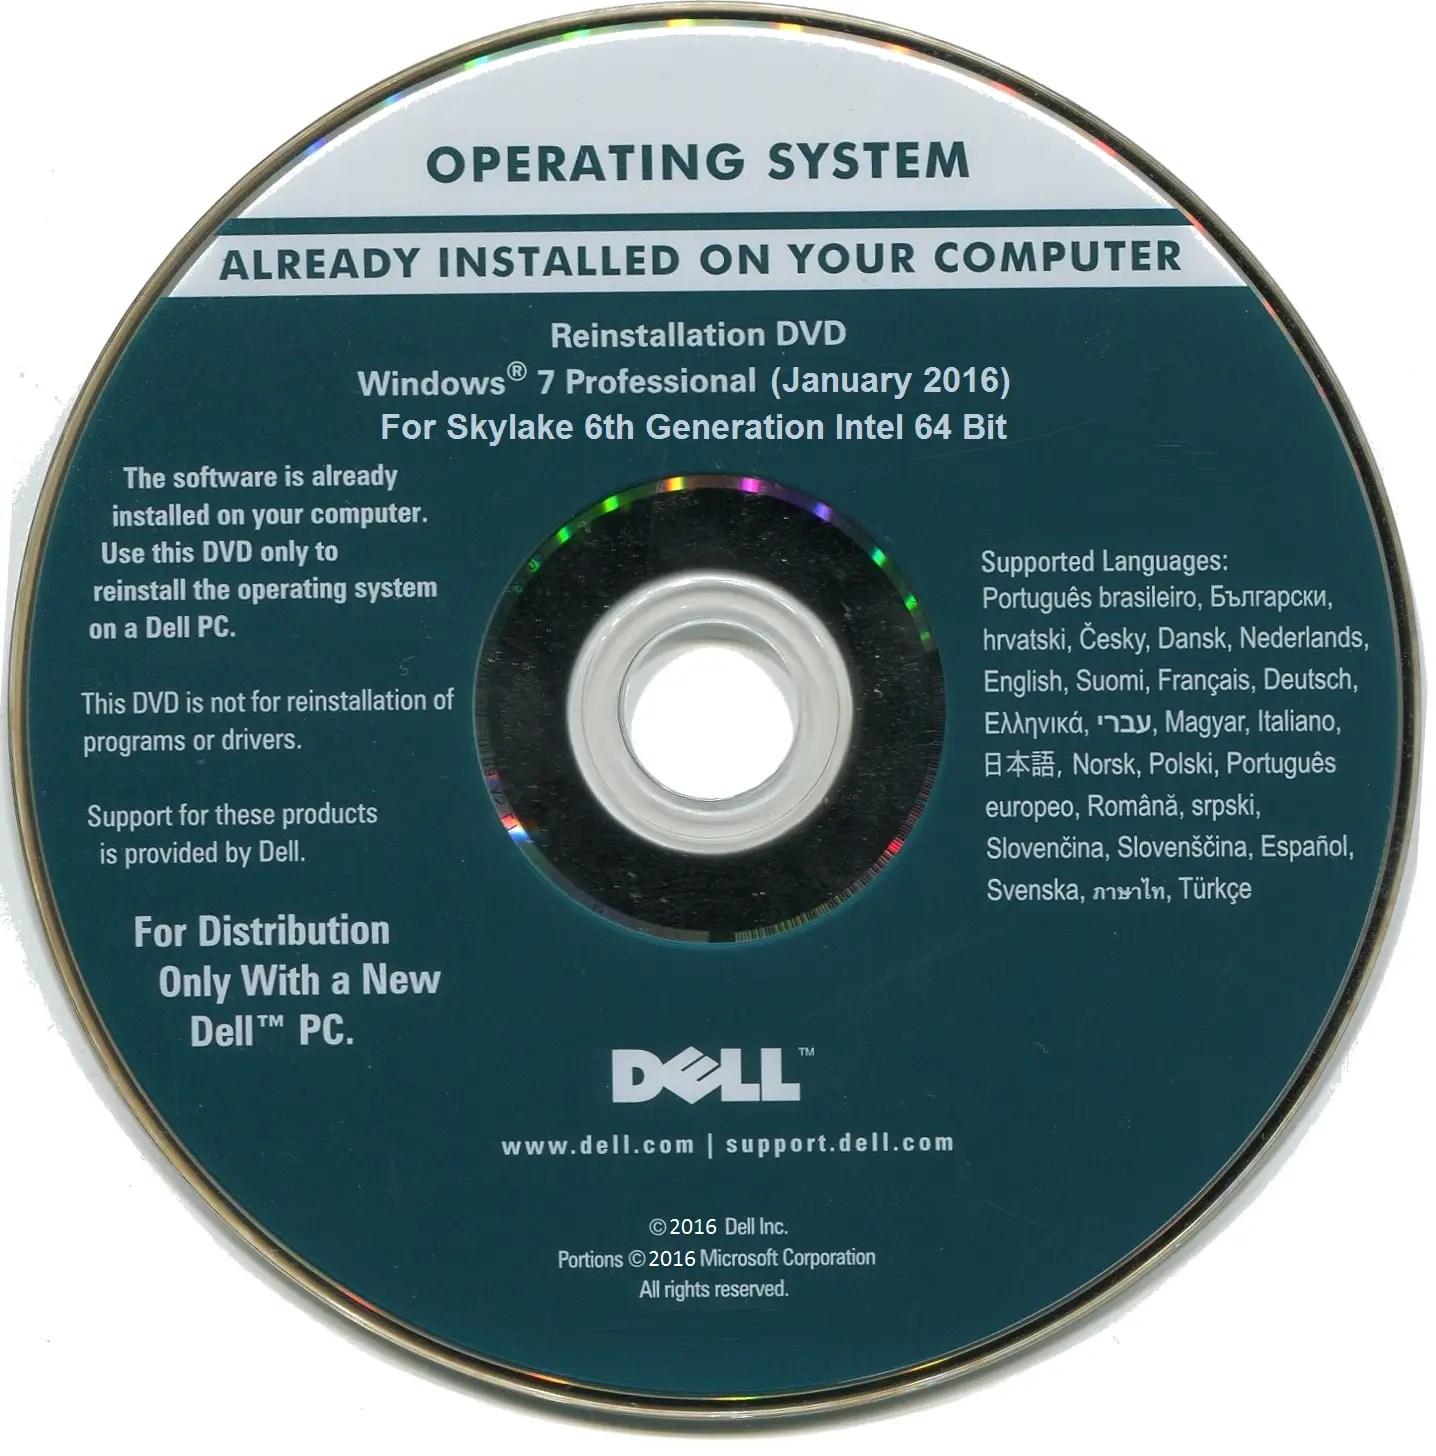 Download Dell Windows 7 Pro OEM Skylake Reinstallation iso - Windows